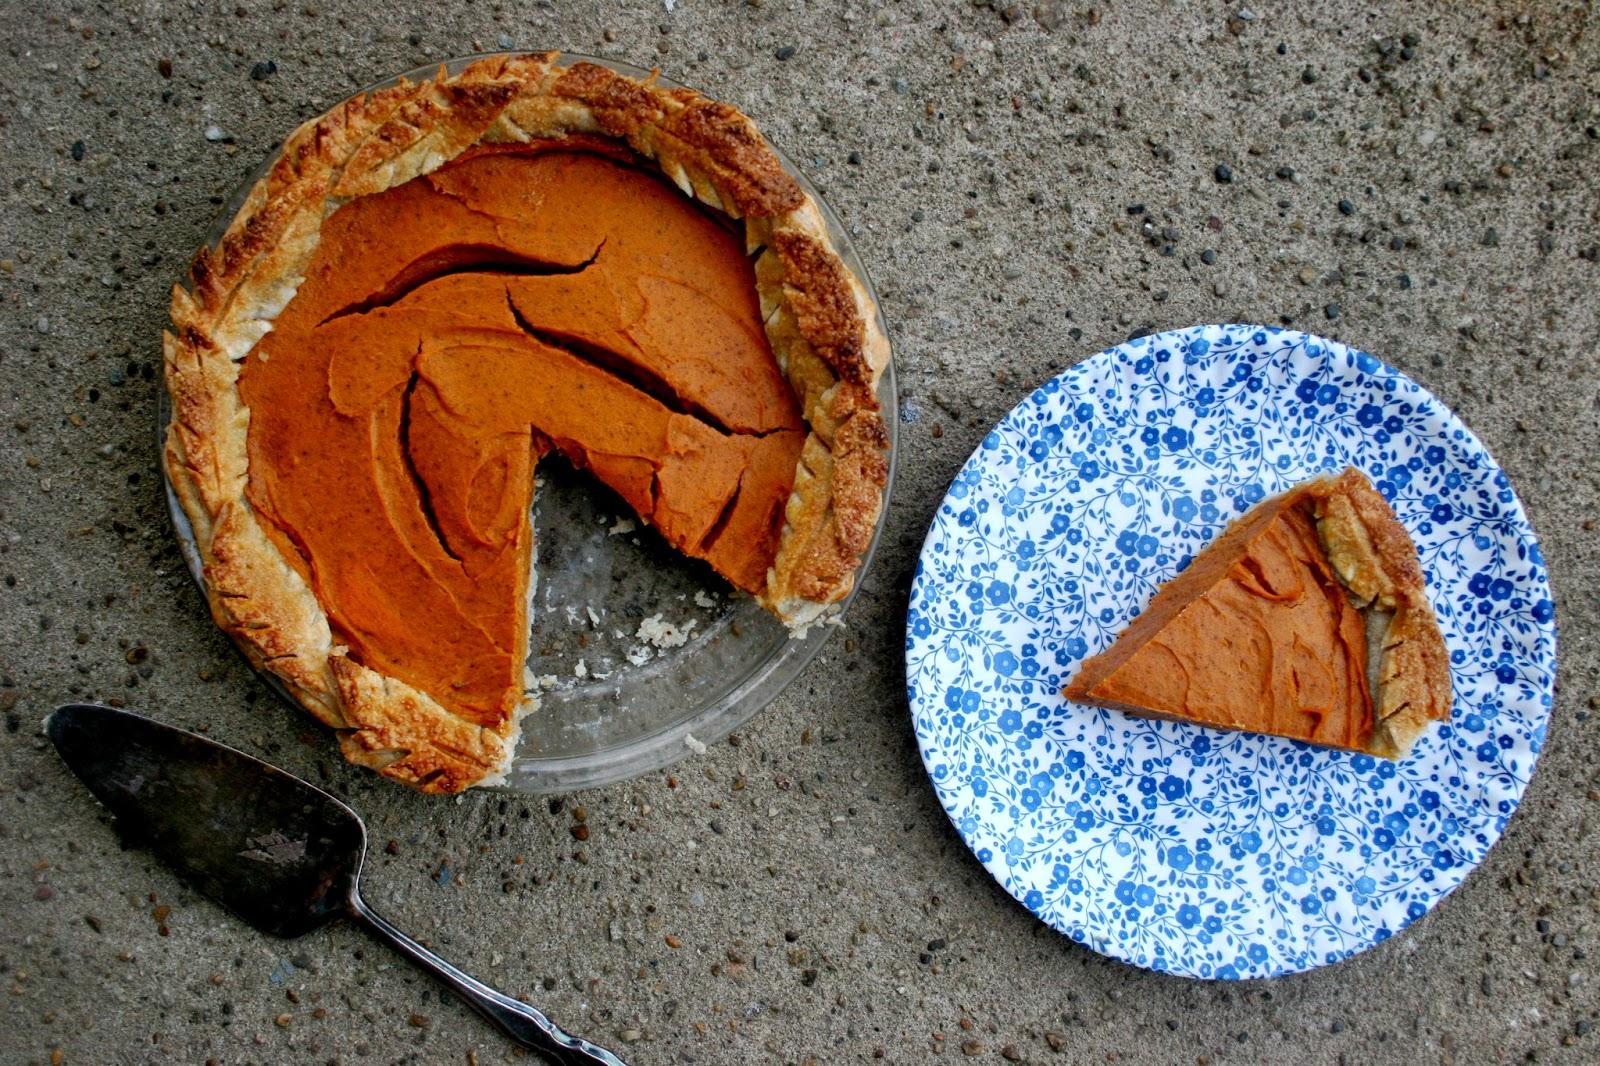 Bakerhand's Sweet Potato Pie with Cornmeal Crust